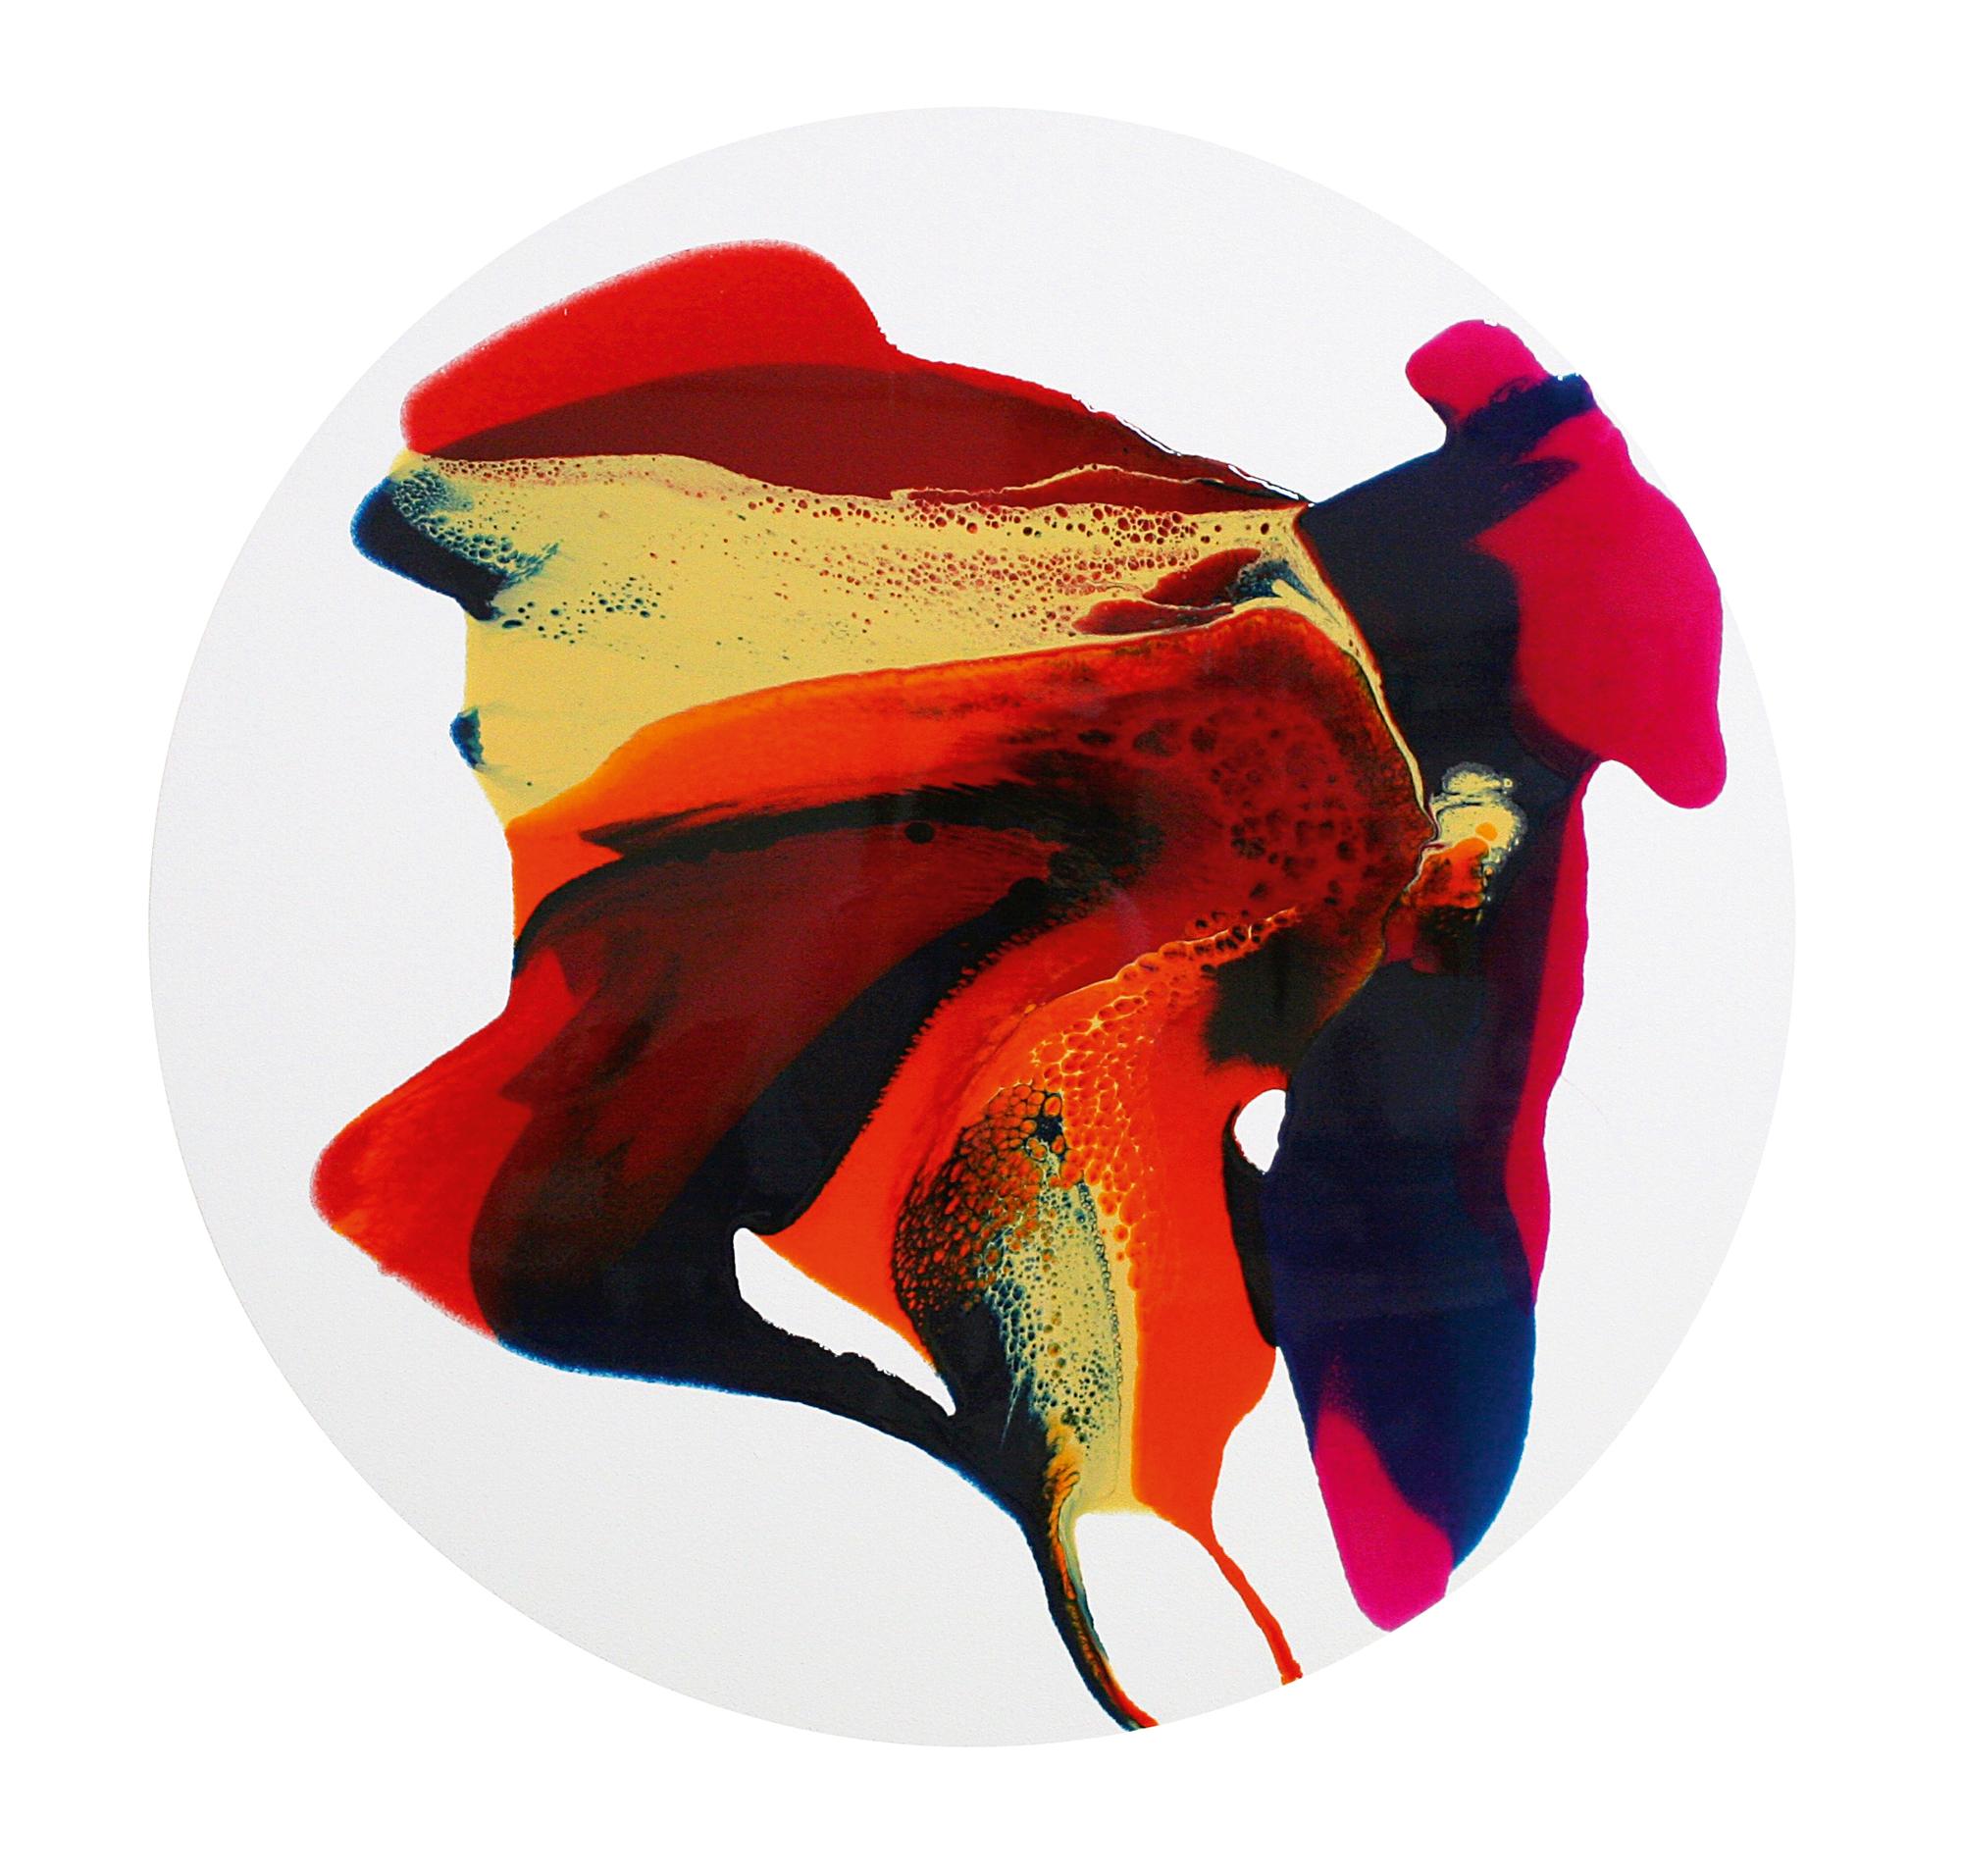 'Ray' Orlanda Broom Resin on canvas, 90cm x 90cm, 2016